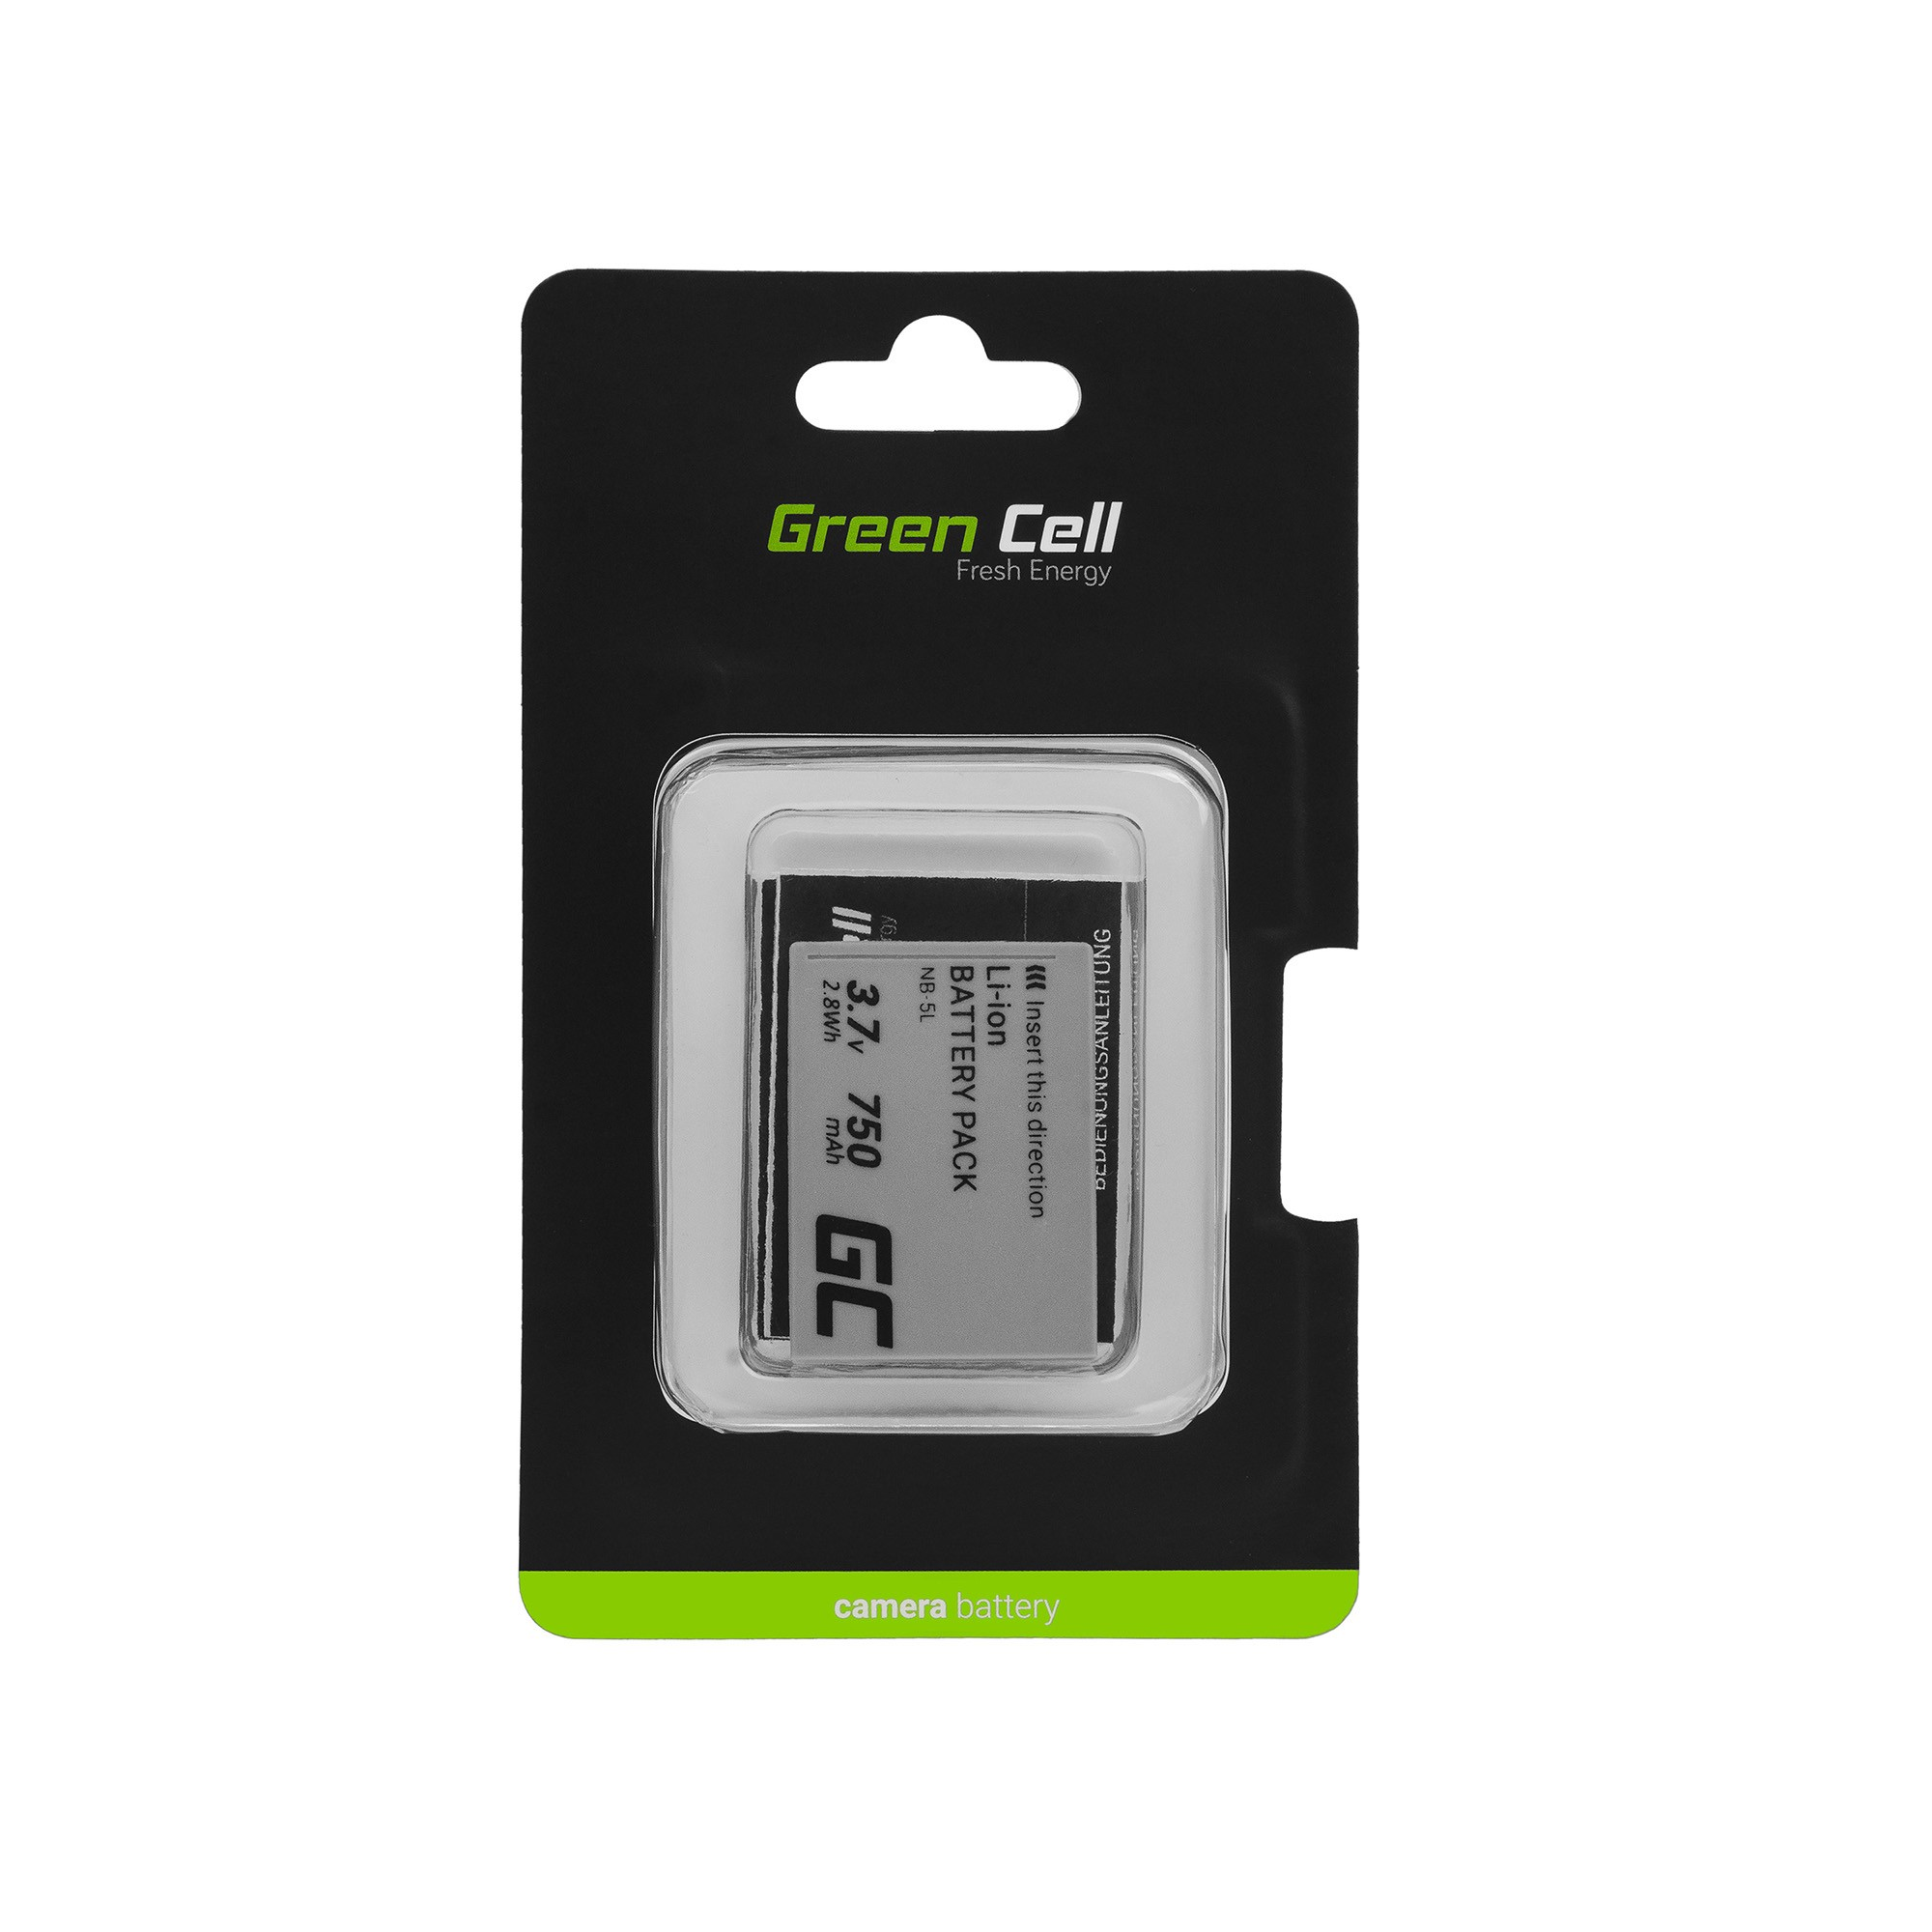 Batterier NB-5L Green Cell Zur Kamera Canon Digital IXUS 800 860 Digital IXY 800 2000 Powershot S110 SD790